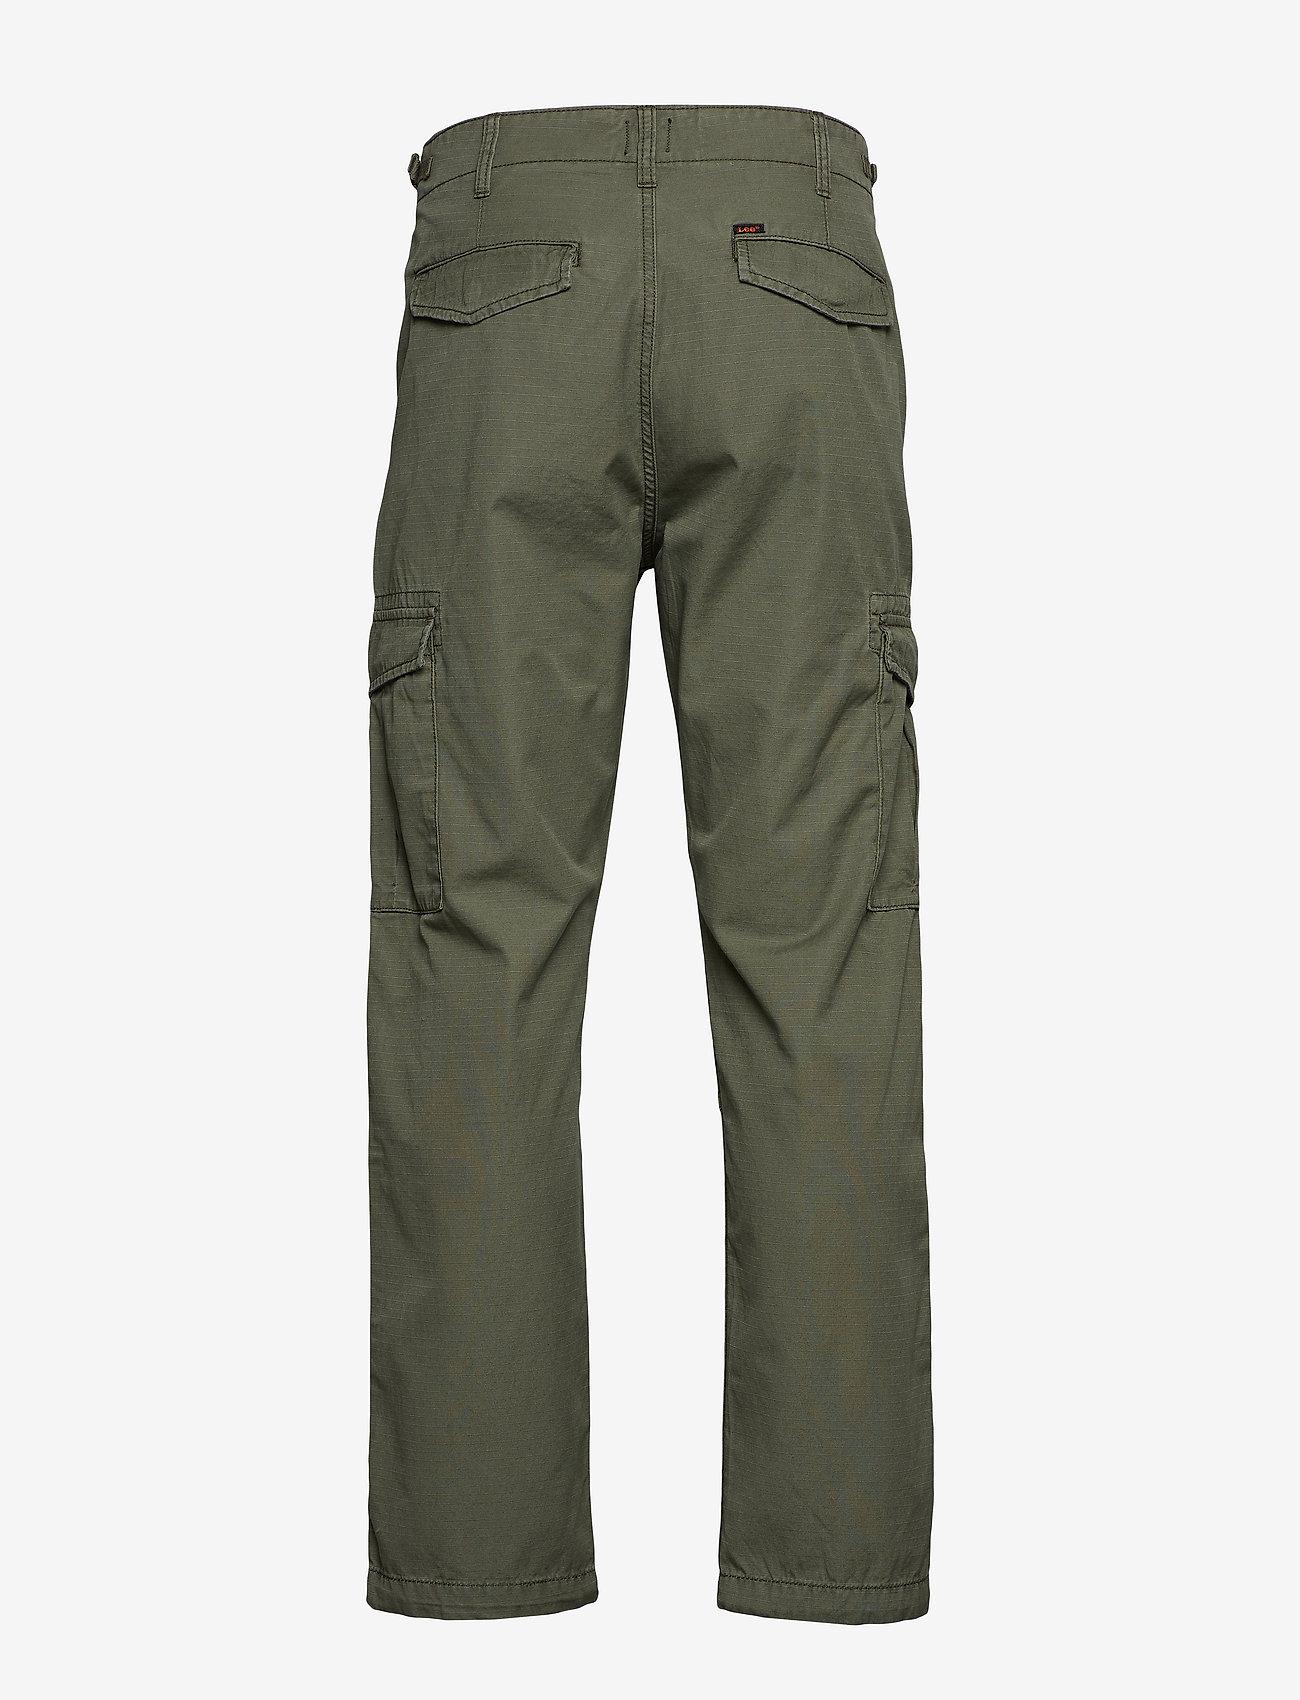 Lee Jeans - FATIGUE PANT - bojówki - khaki - 1